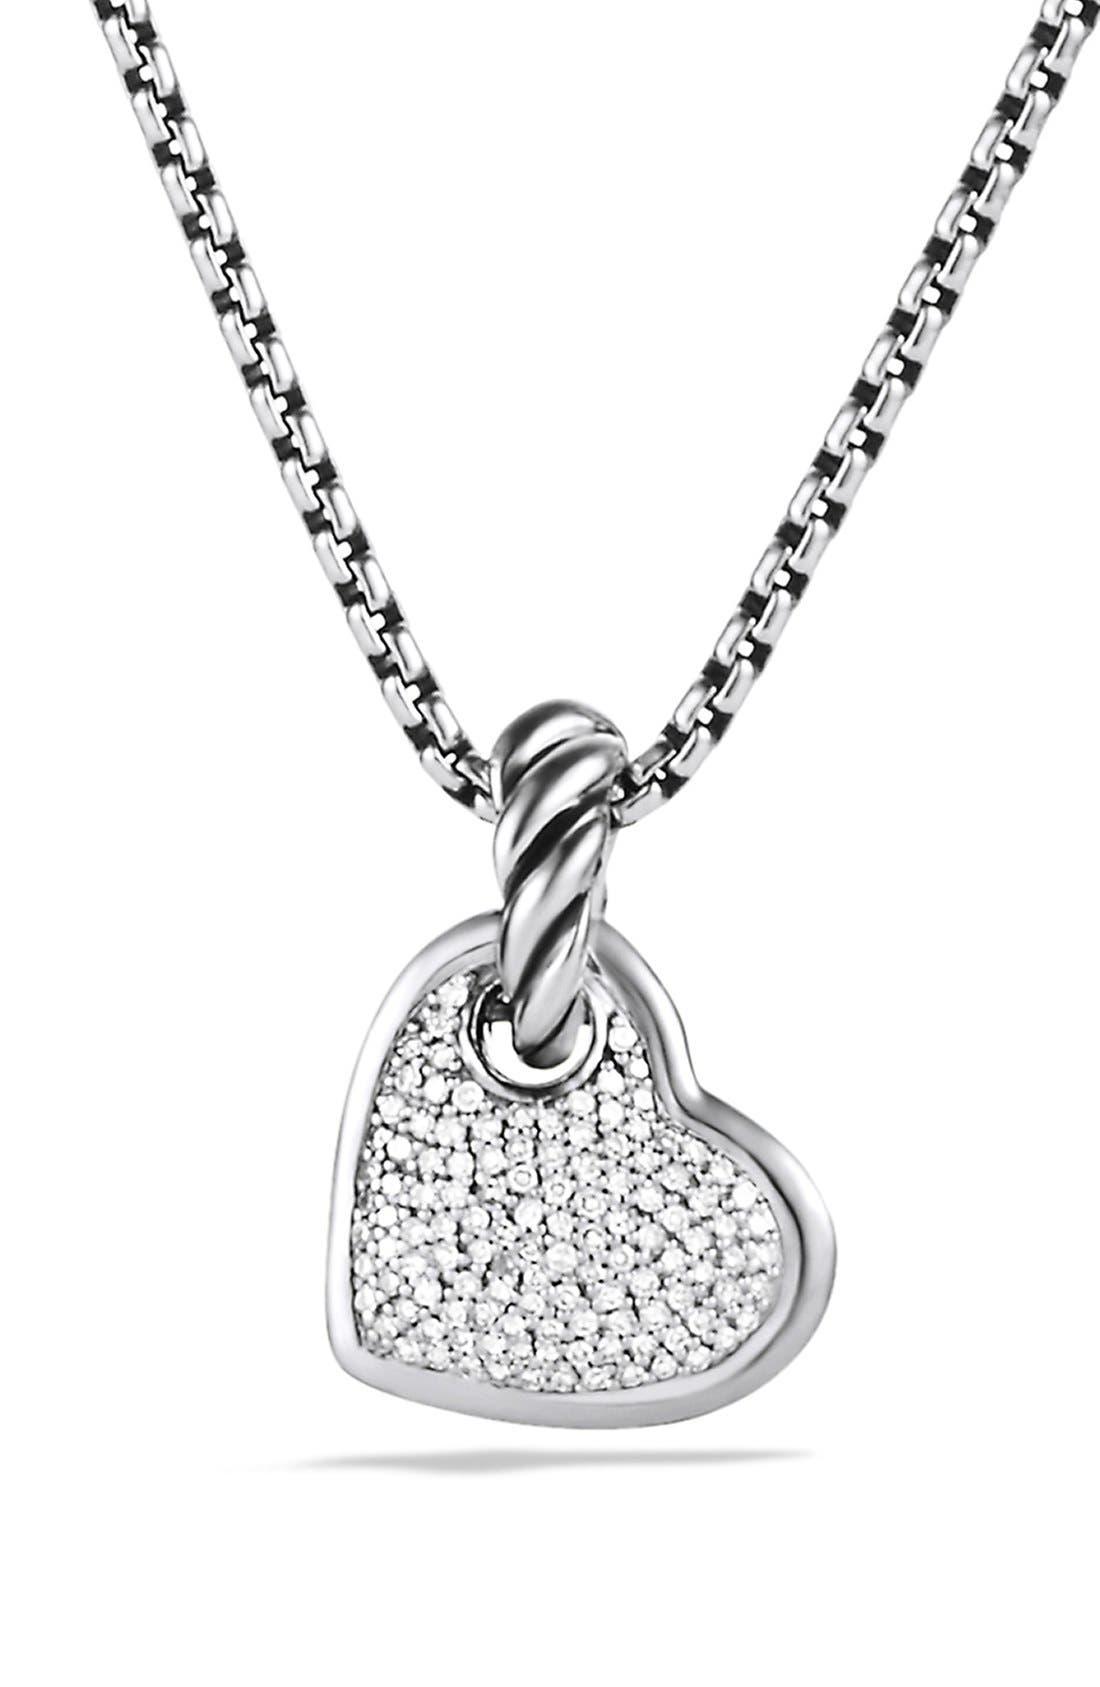 Alternate Image 1 Selected - David Yurman 'Cable Heart' Pendant with Diamonds